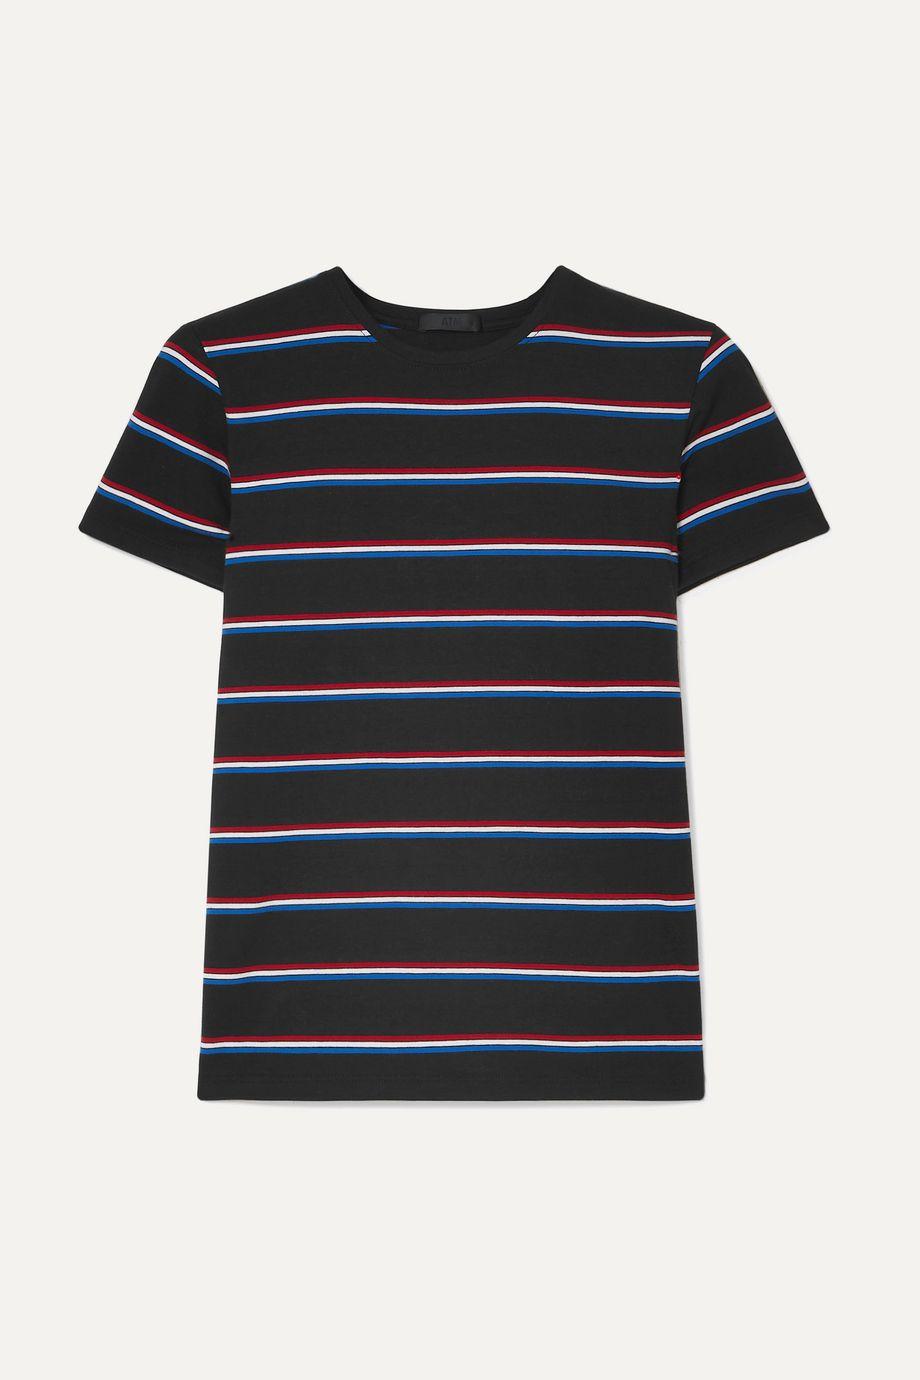 ATM Anthony Thomas Melillo Striped stretch-Pima cotton jersey T-shirt